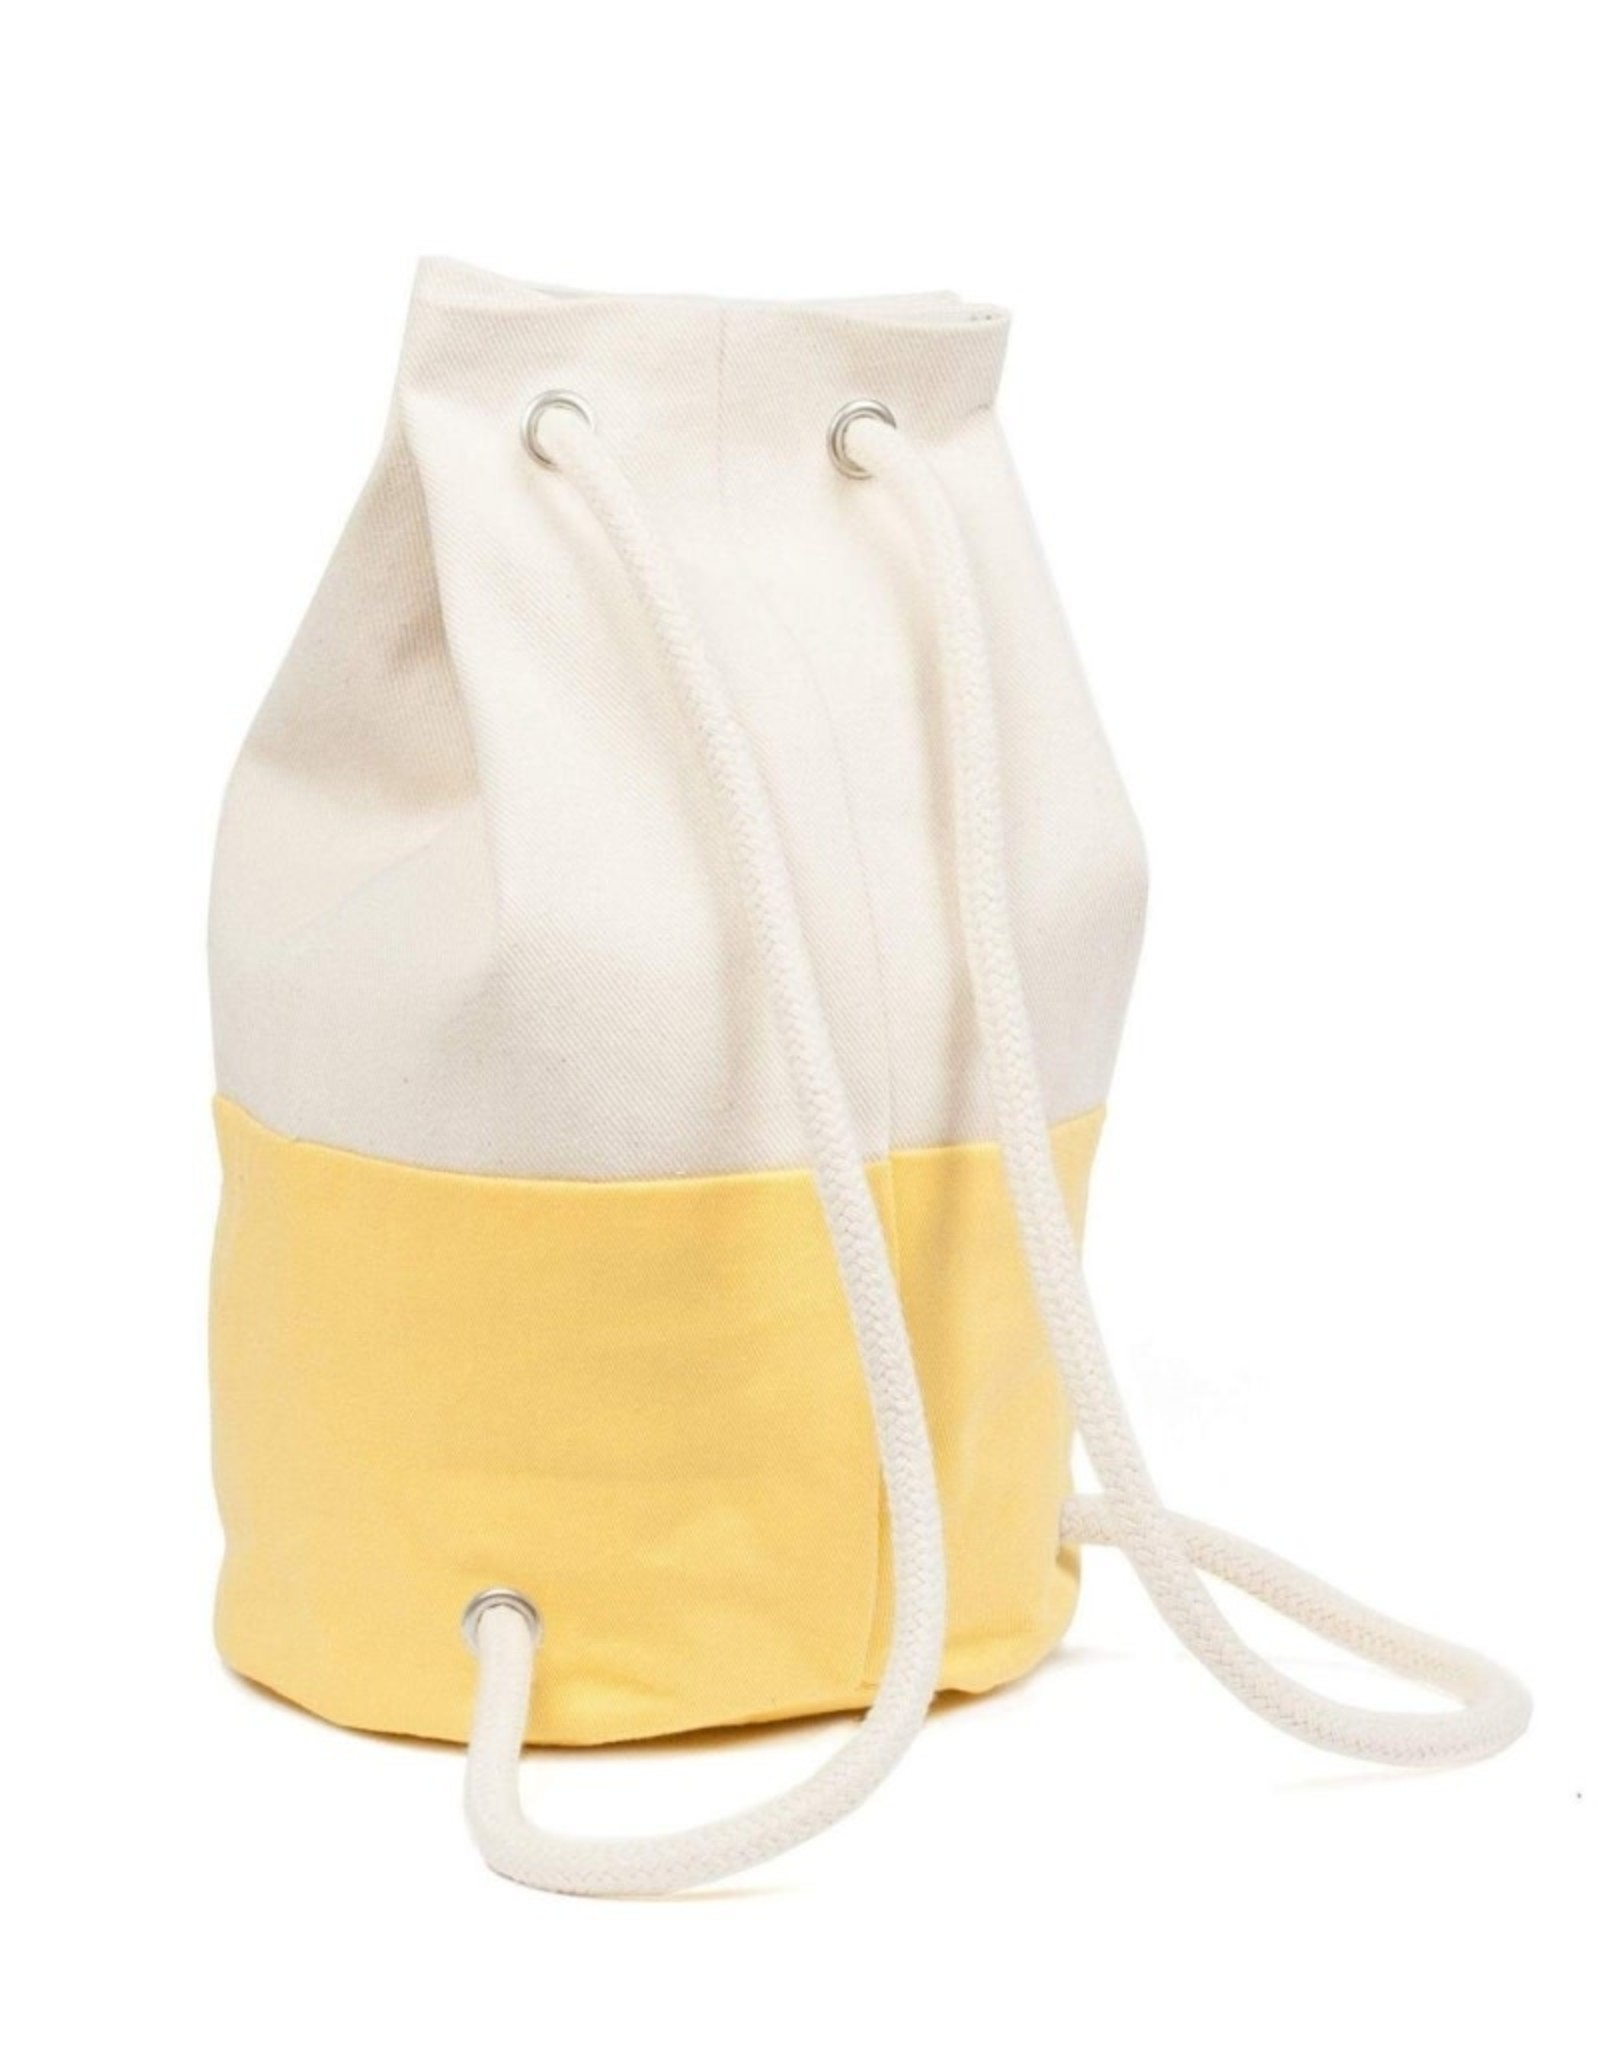 Marin Et Marine Sac Marin Mini Bag